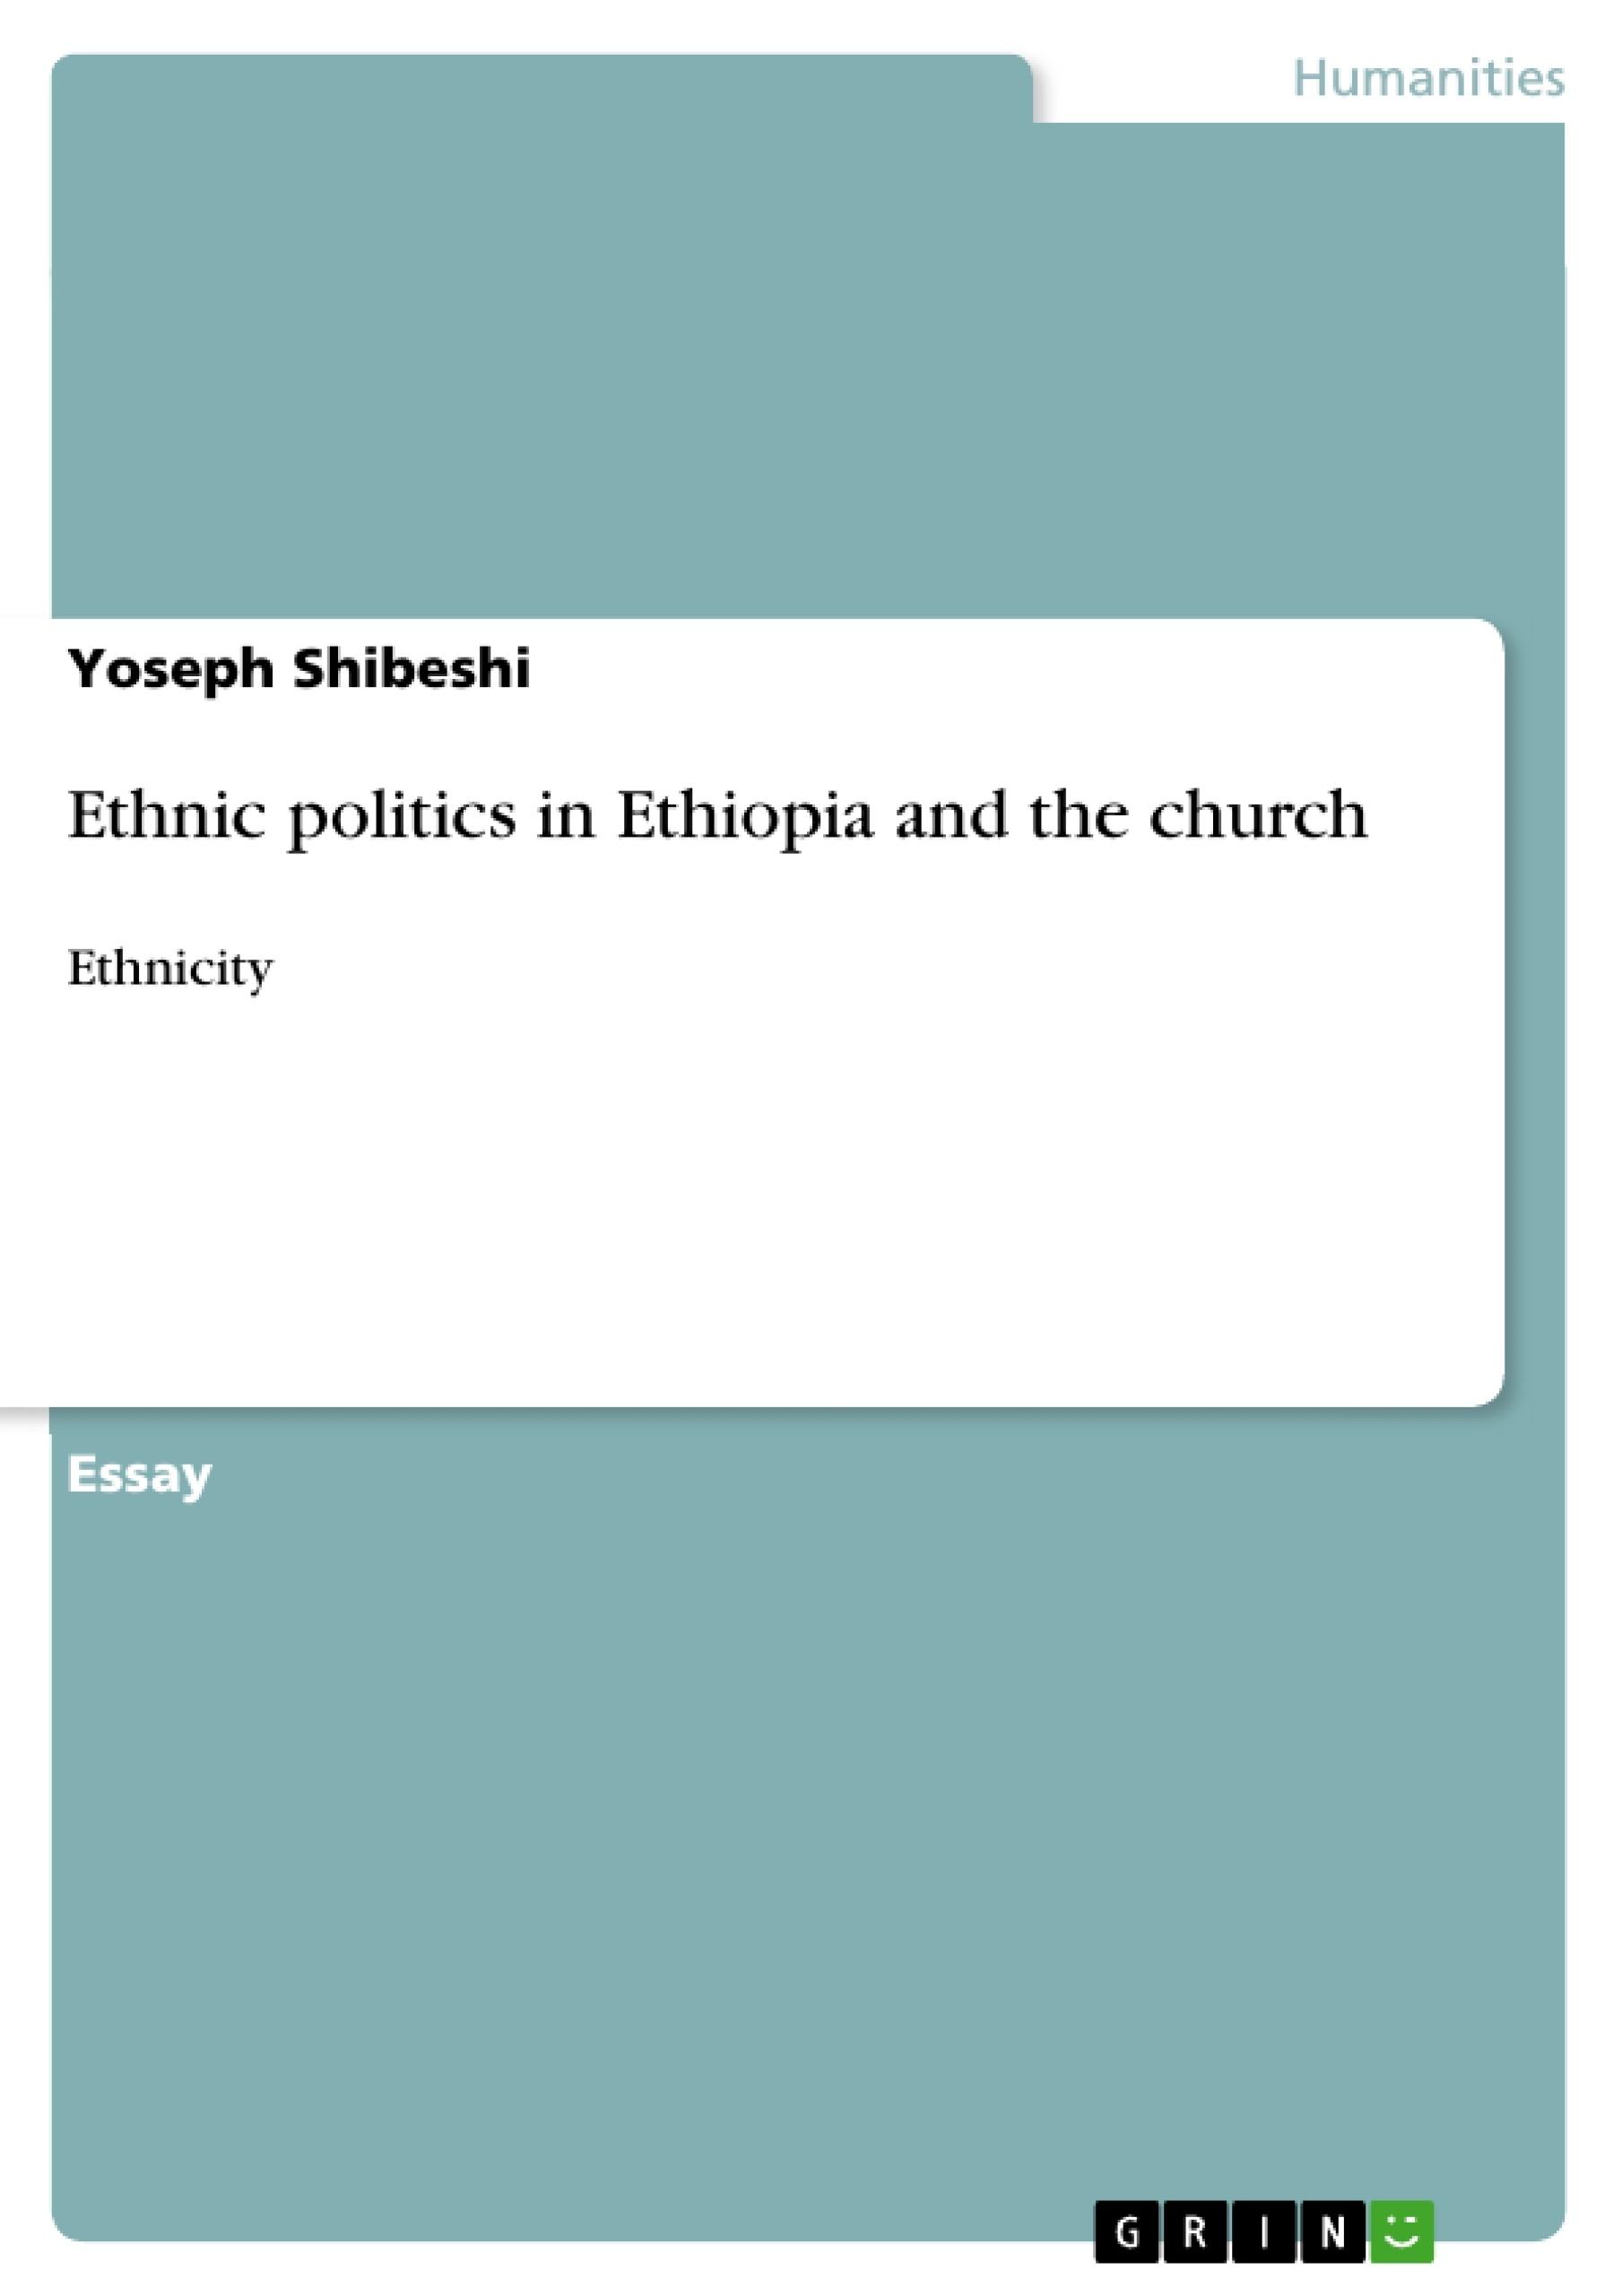 Title: Ethnic politics in Ethiopia and the church